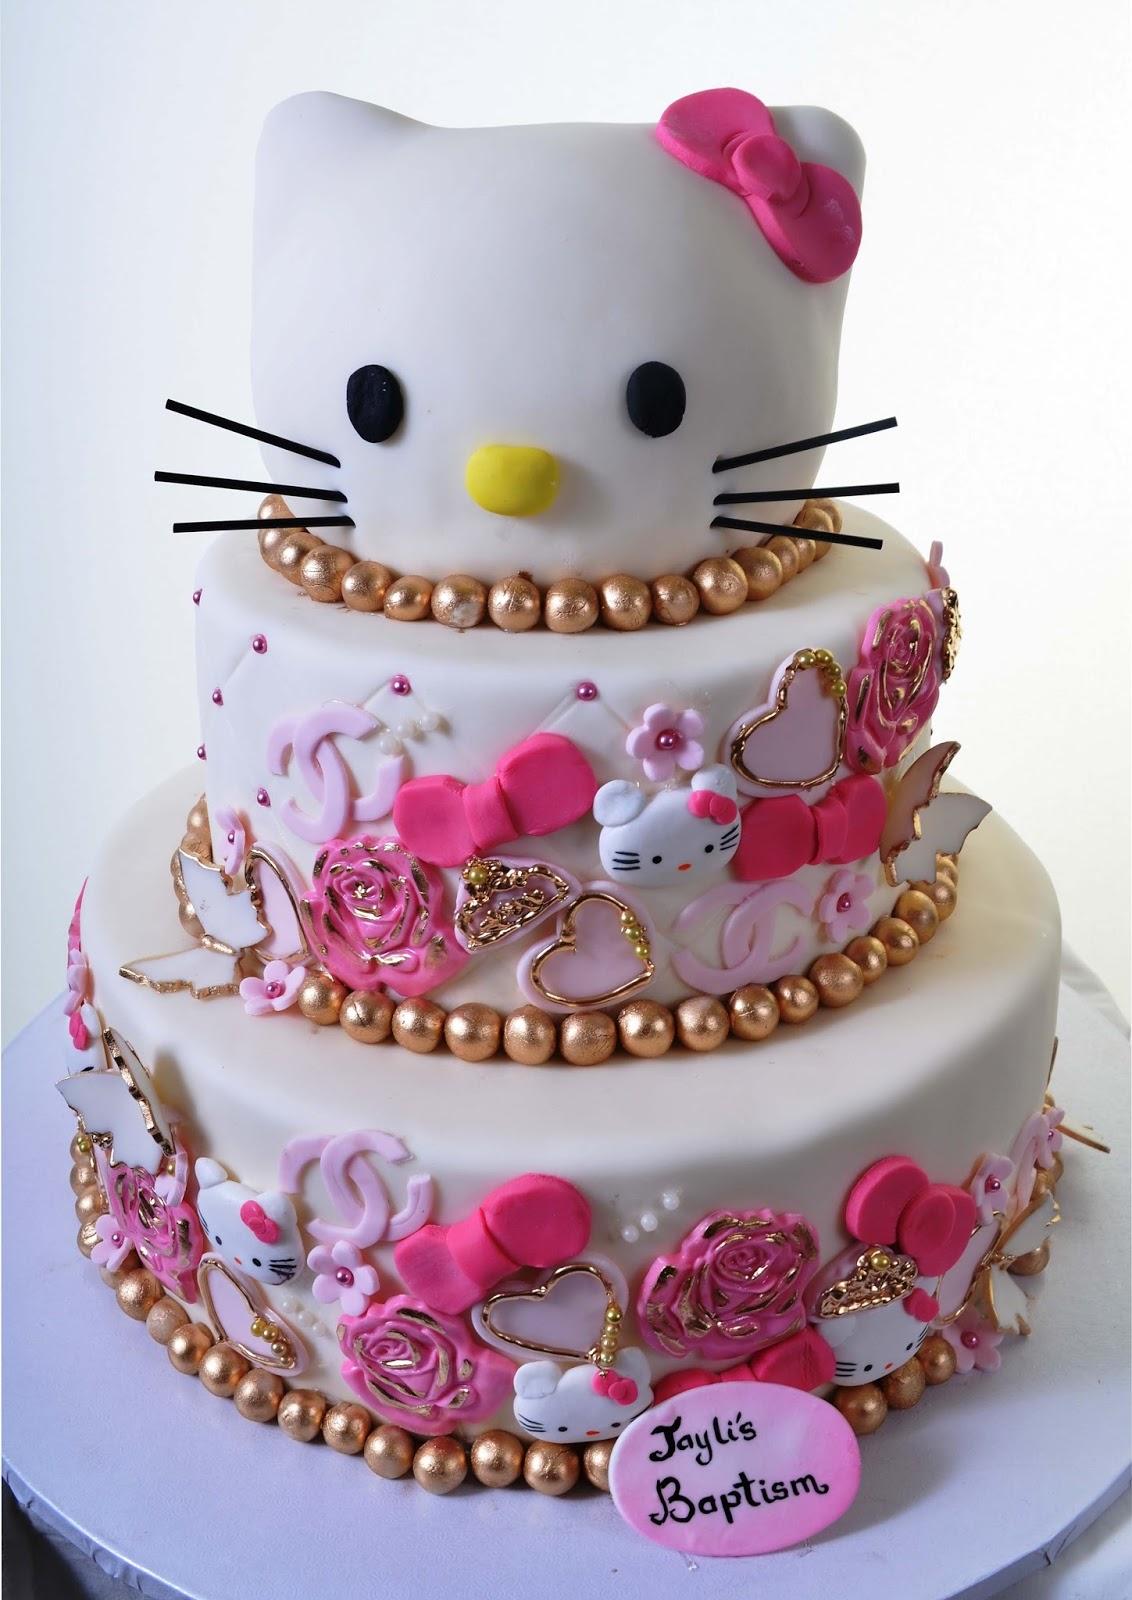 10 Hello Kitty Cake Decorations Ideas